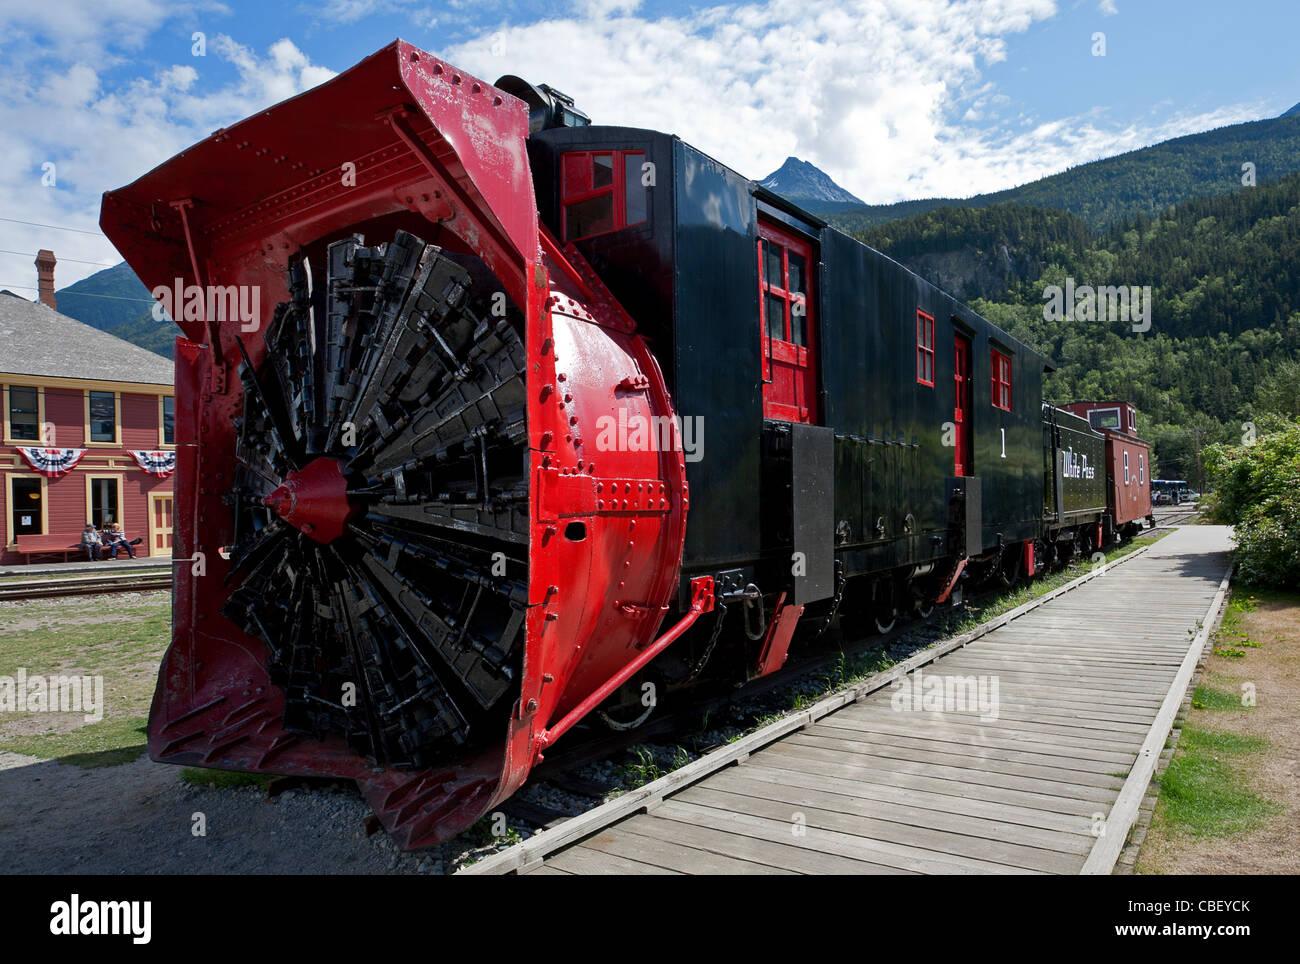 Rotary snowplow locomotive. Skagway. Alaska. USA - Stock Image